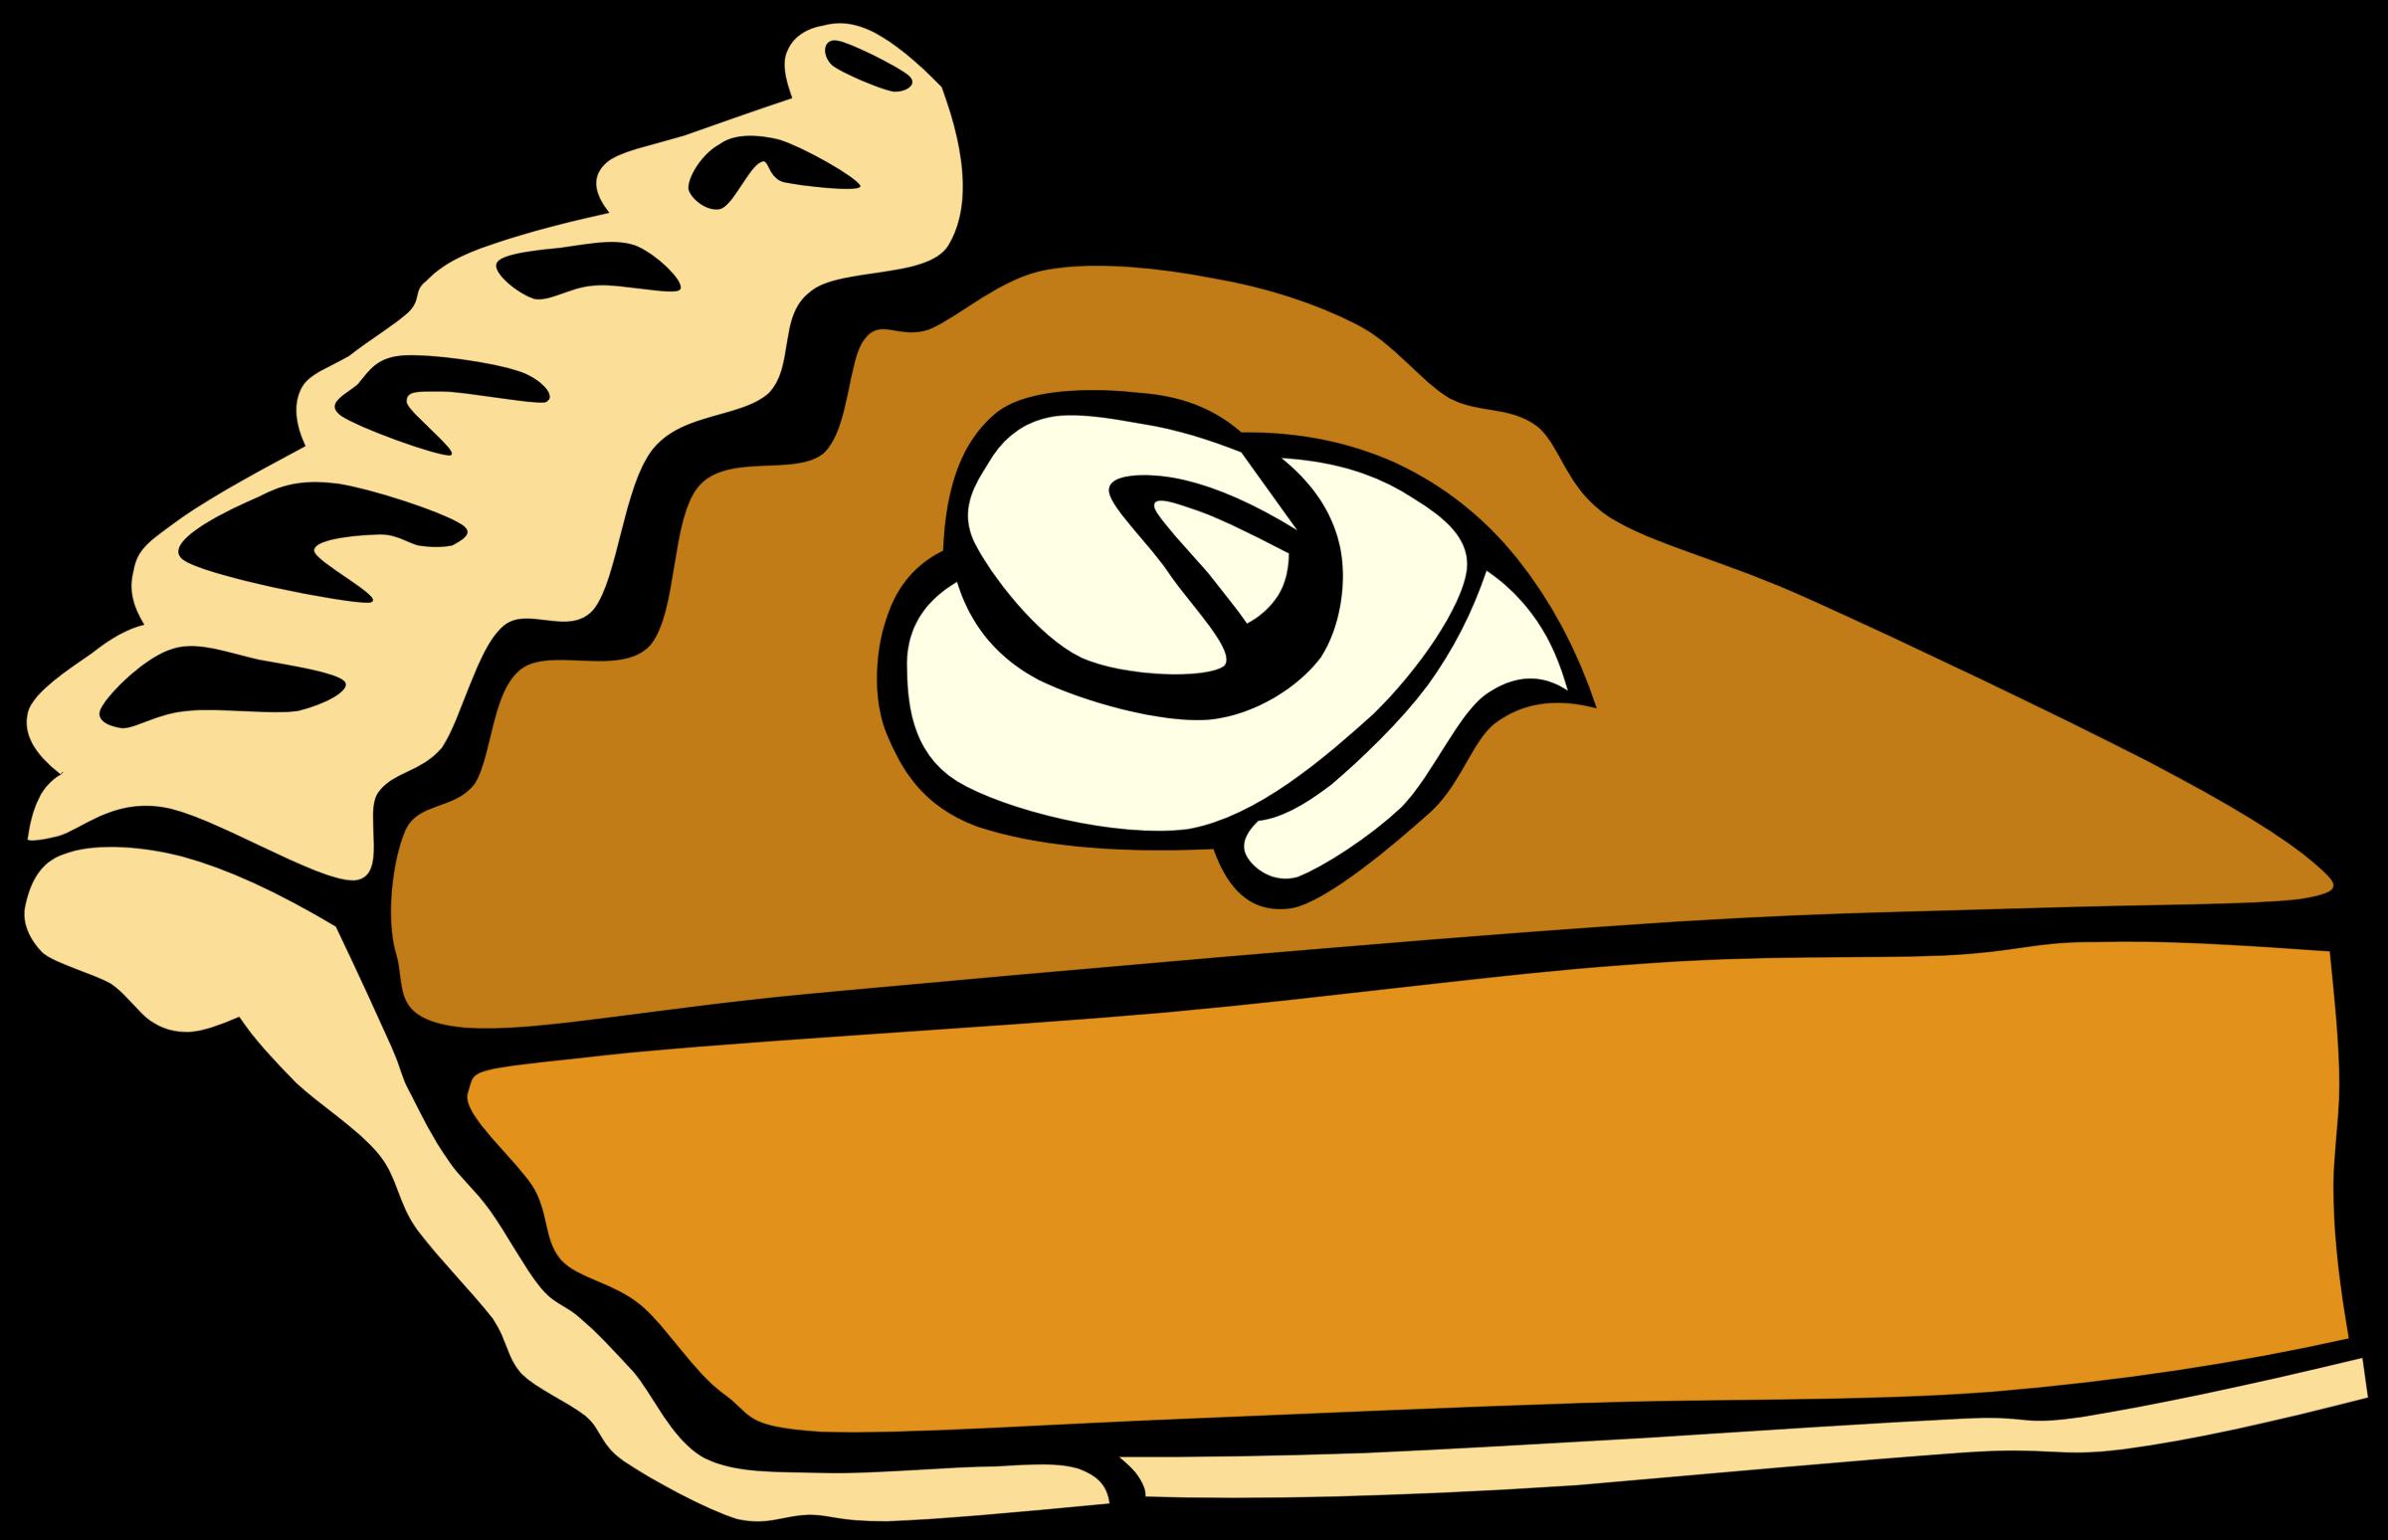 Pie clipart pie day. Fast food desserts pies